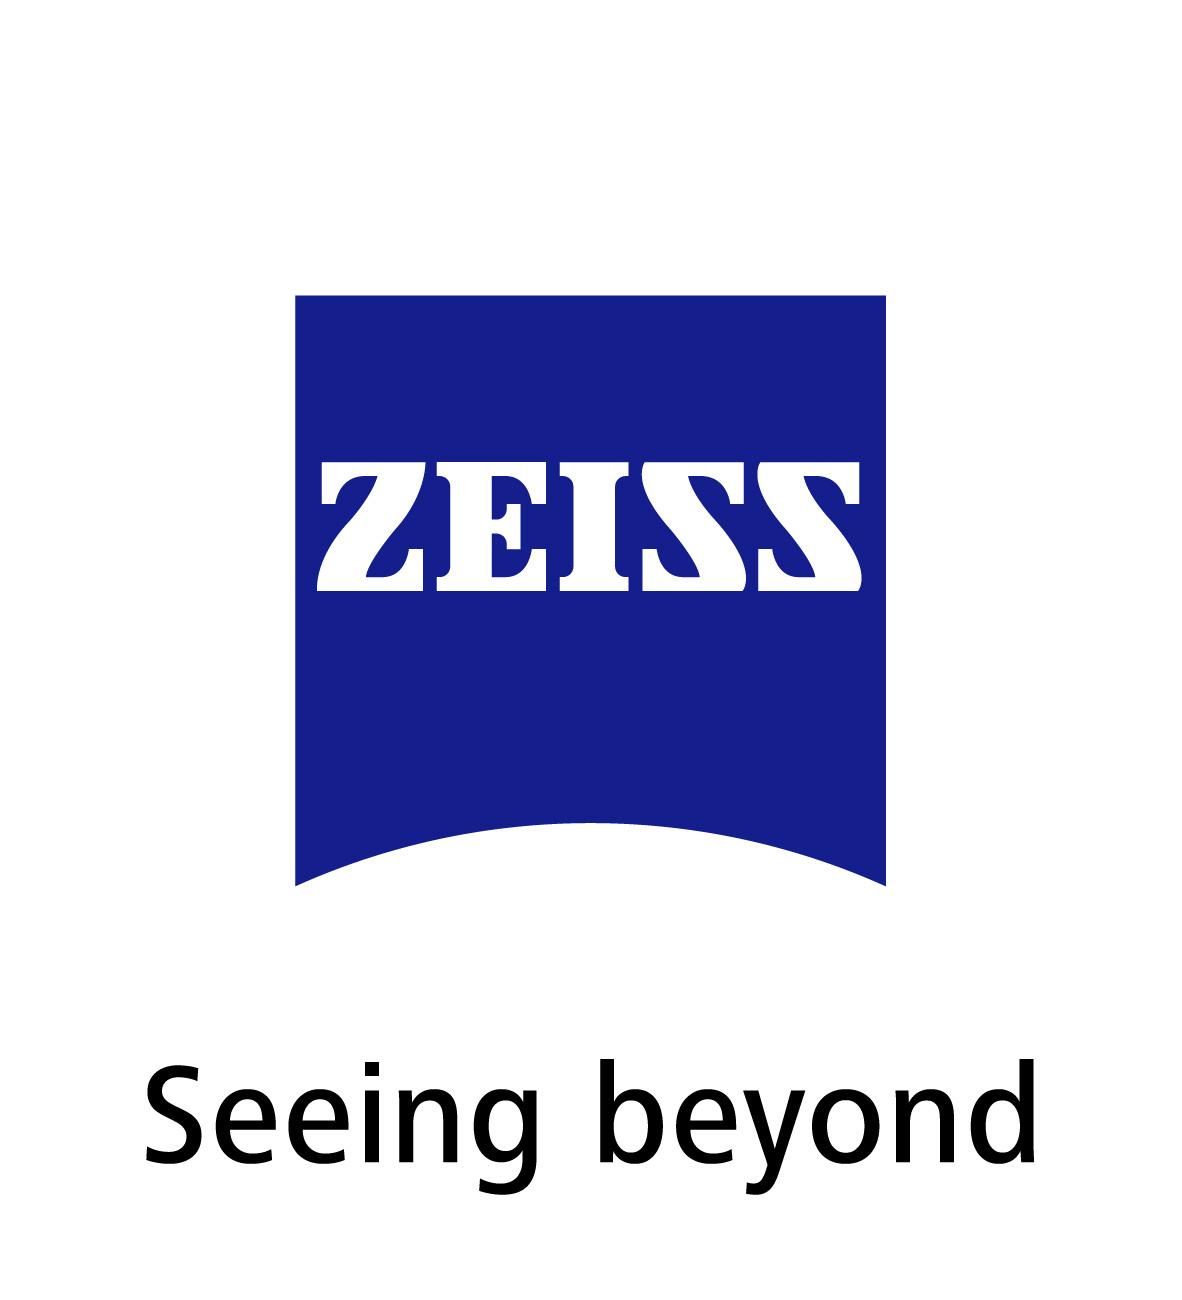 Zeiss | Seeing beyond logo